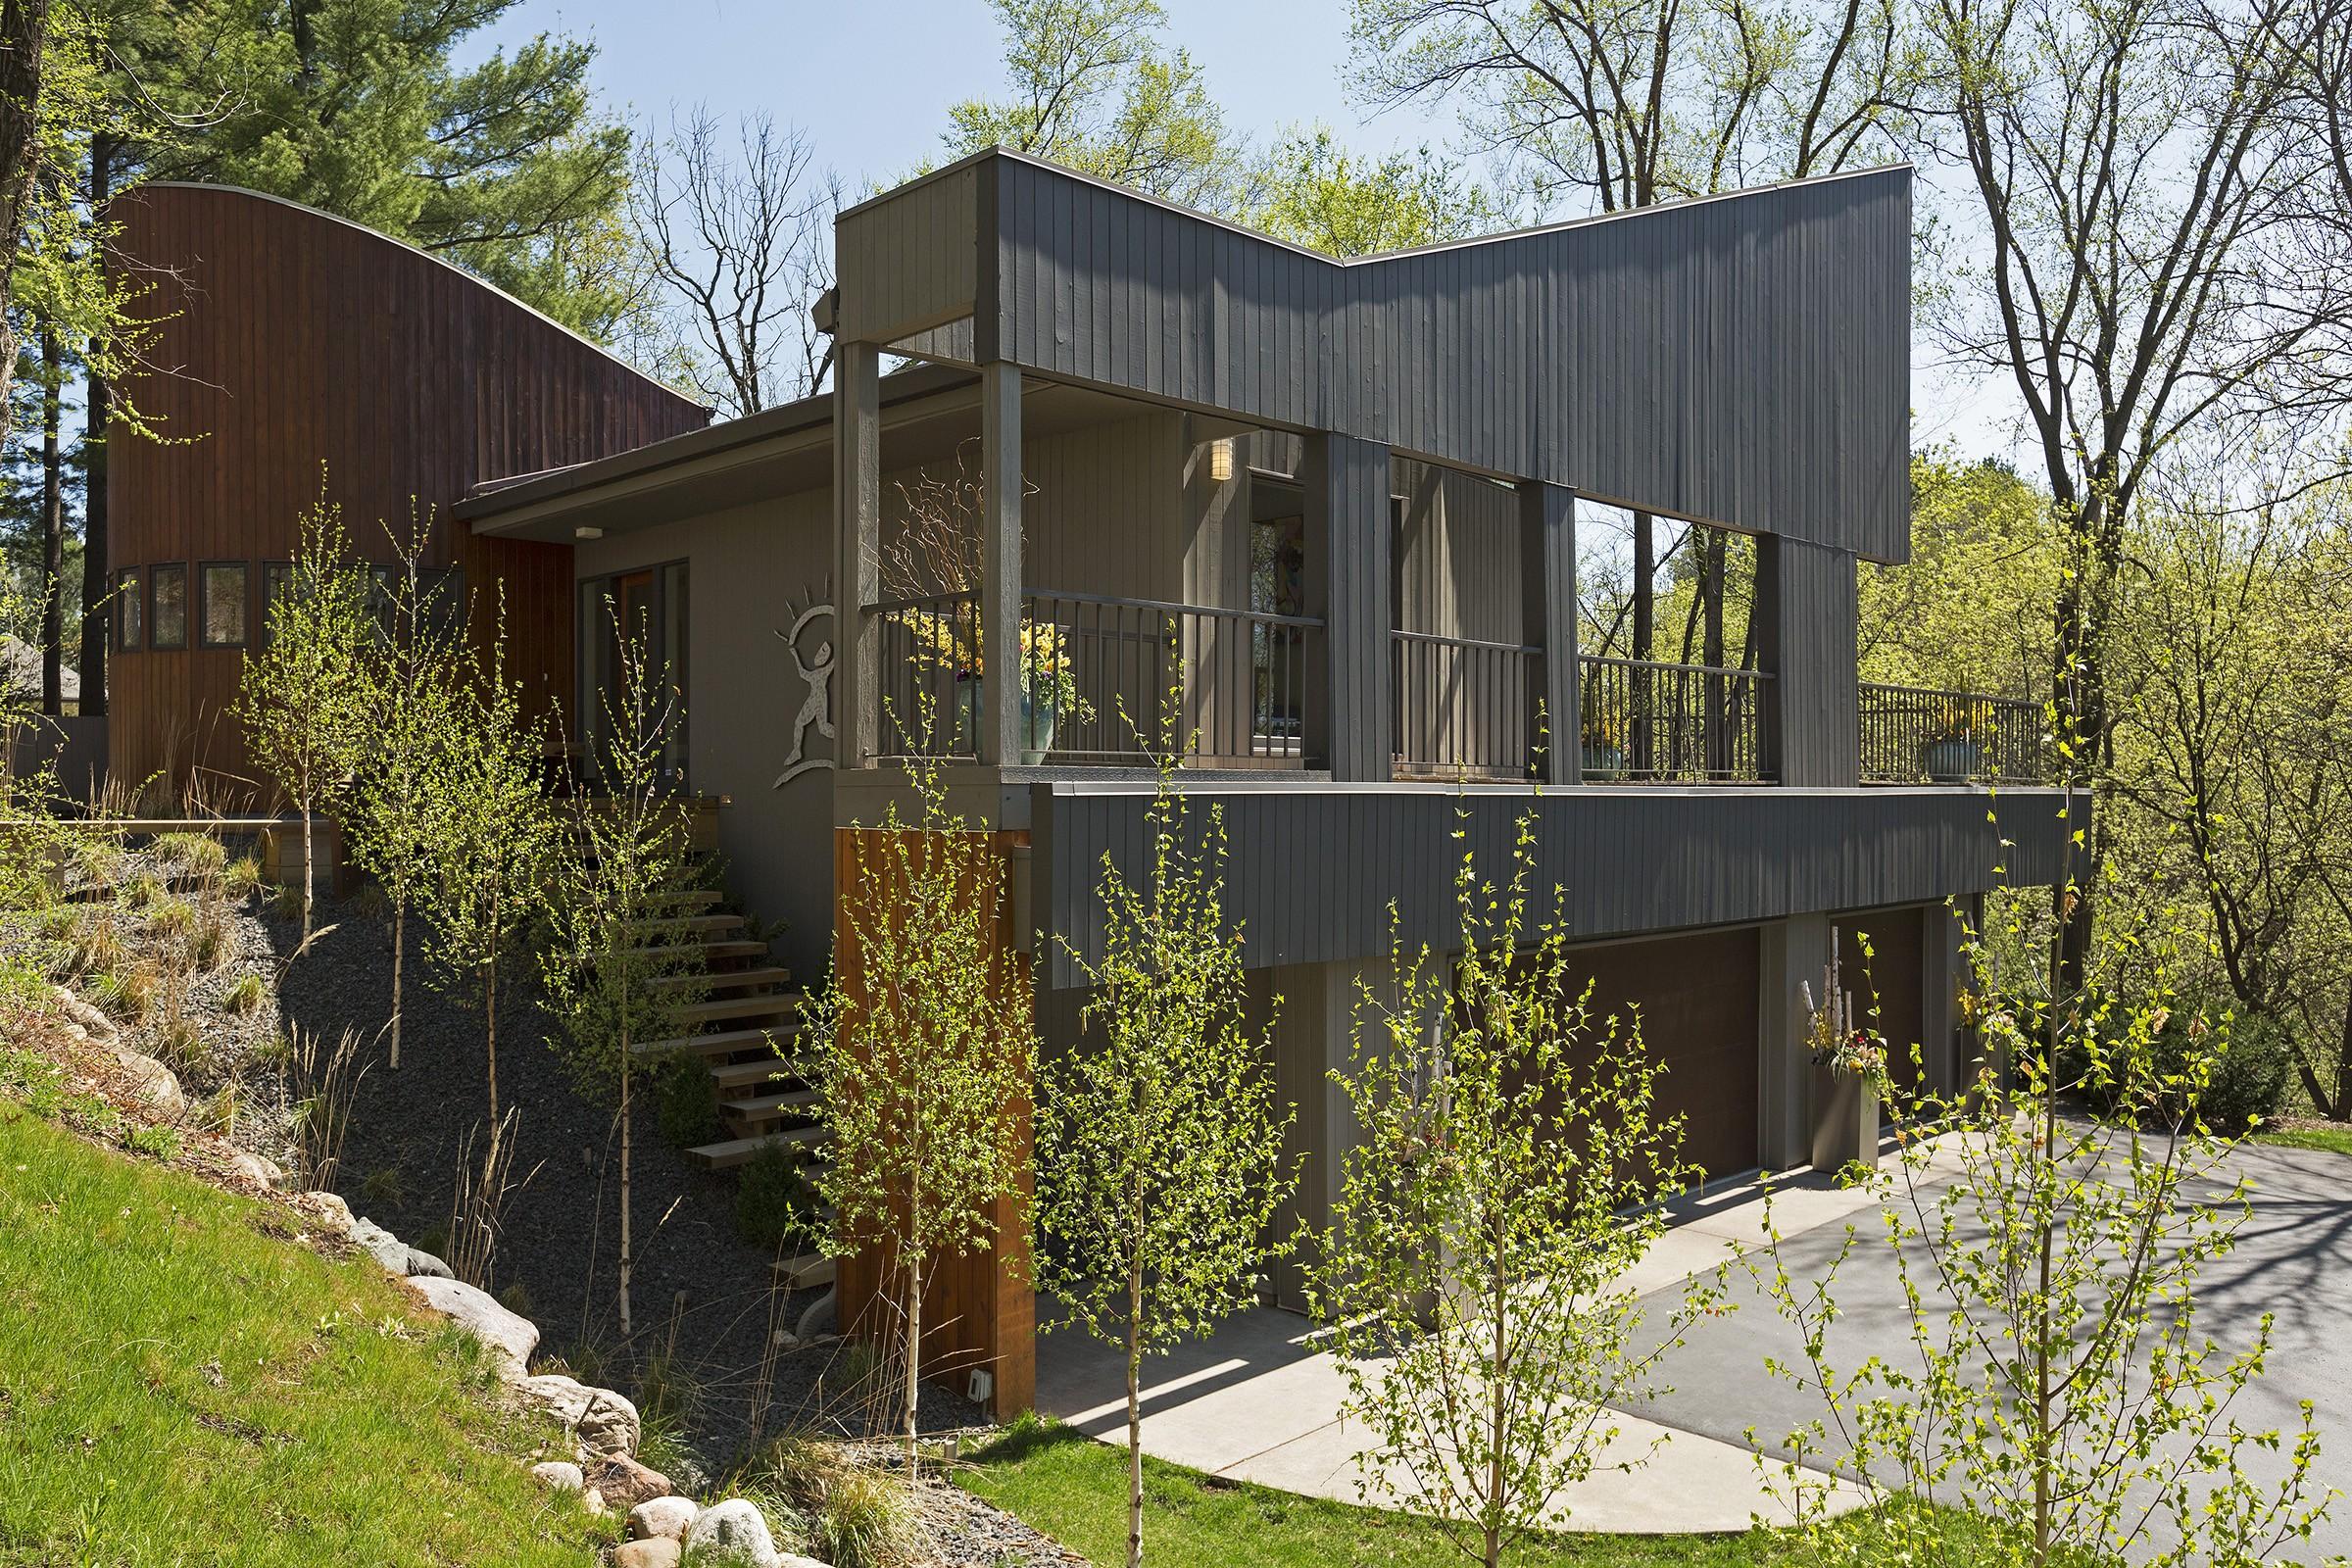 Single Family Home for Sale at 7428 Shannon Circle Edina, Minnesota, 55439 United States